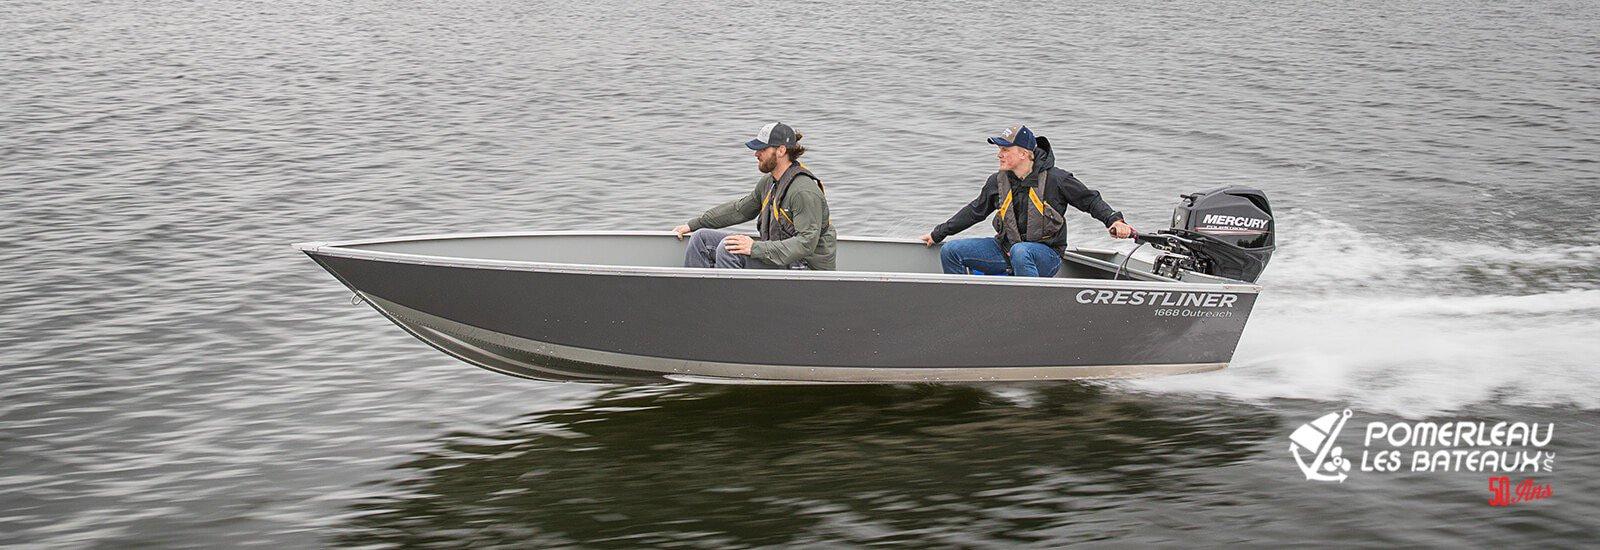 Crestliner 1668 Outreach - boat-main_151252